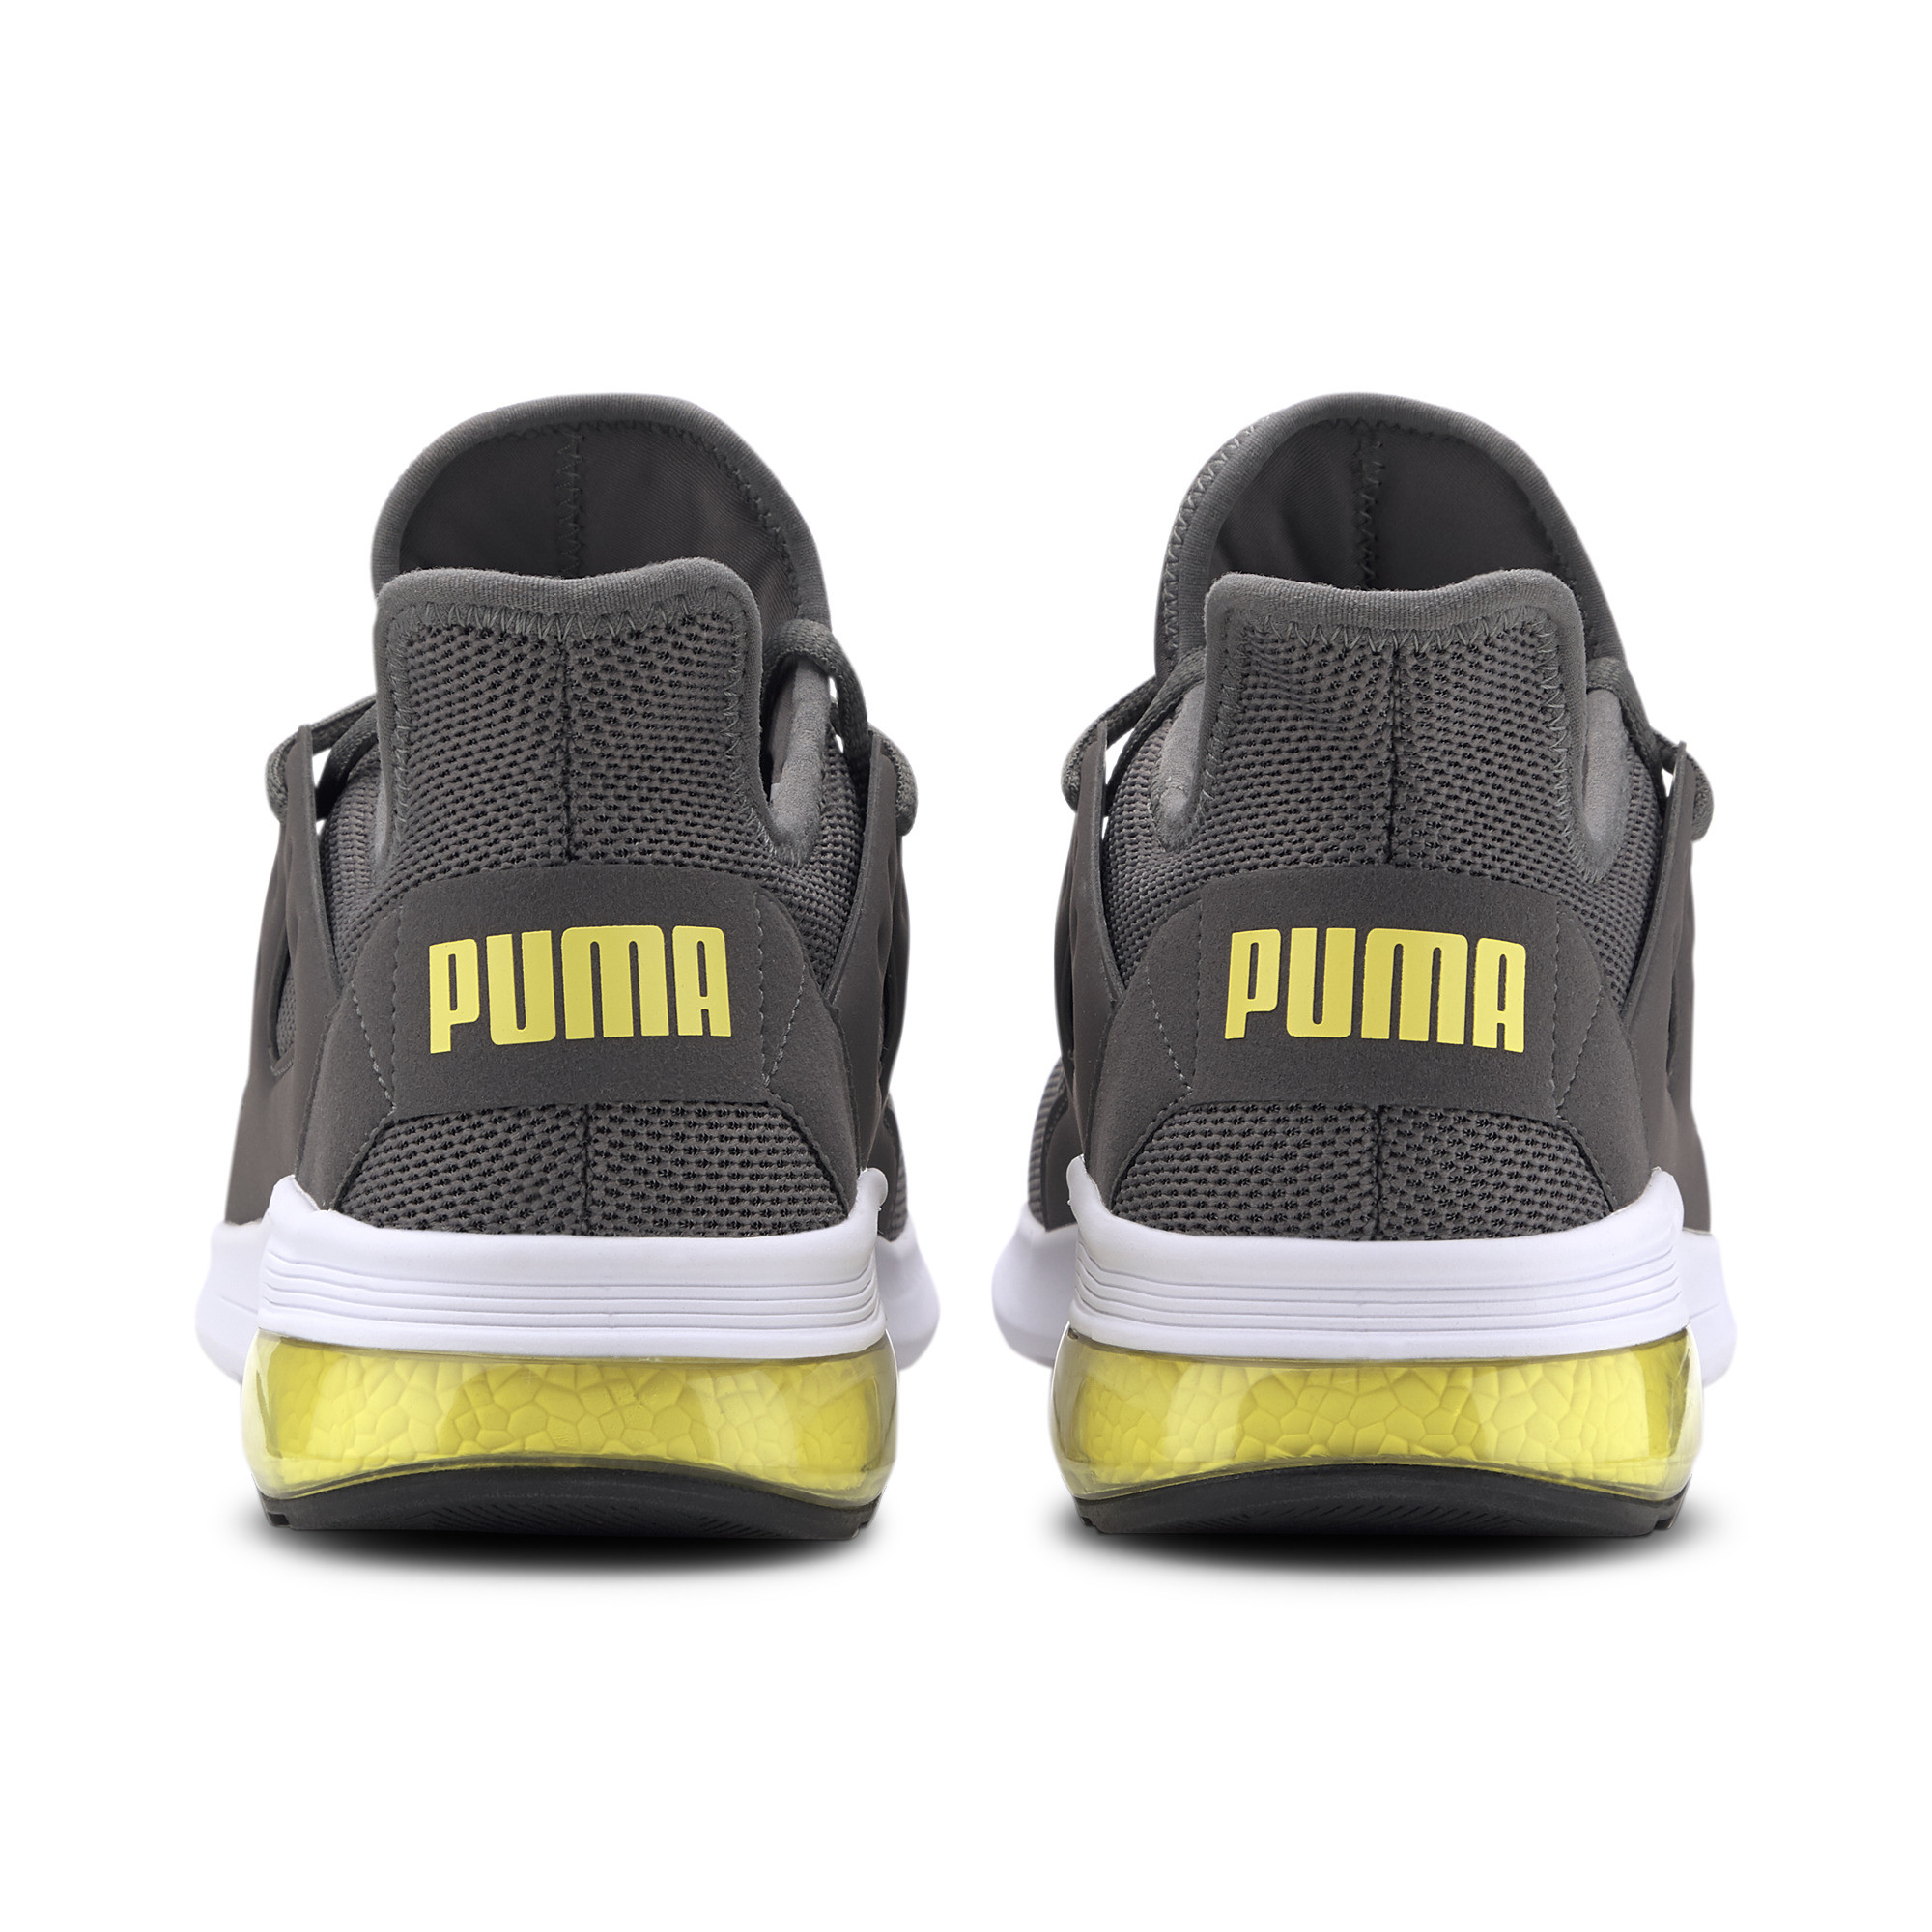 PUMA-Electron-Street-Men-039-s-Sneakers-Men-Shoe-Basics thumbnail 22